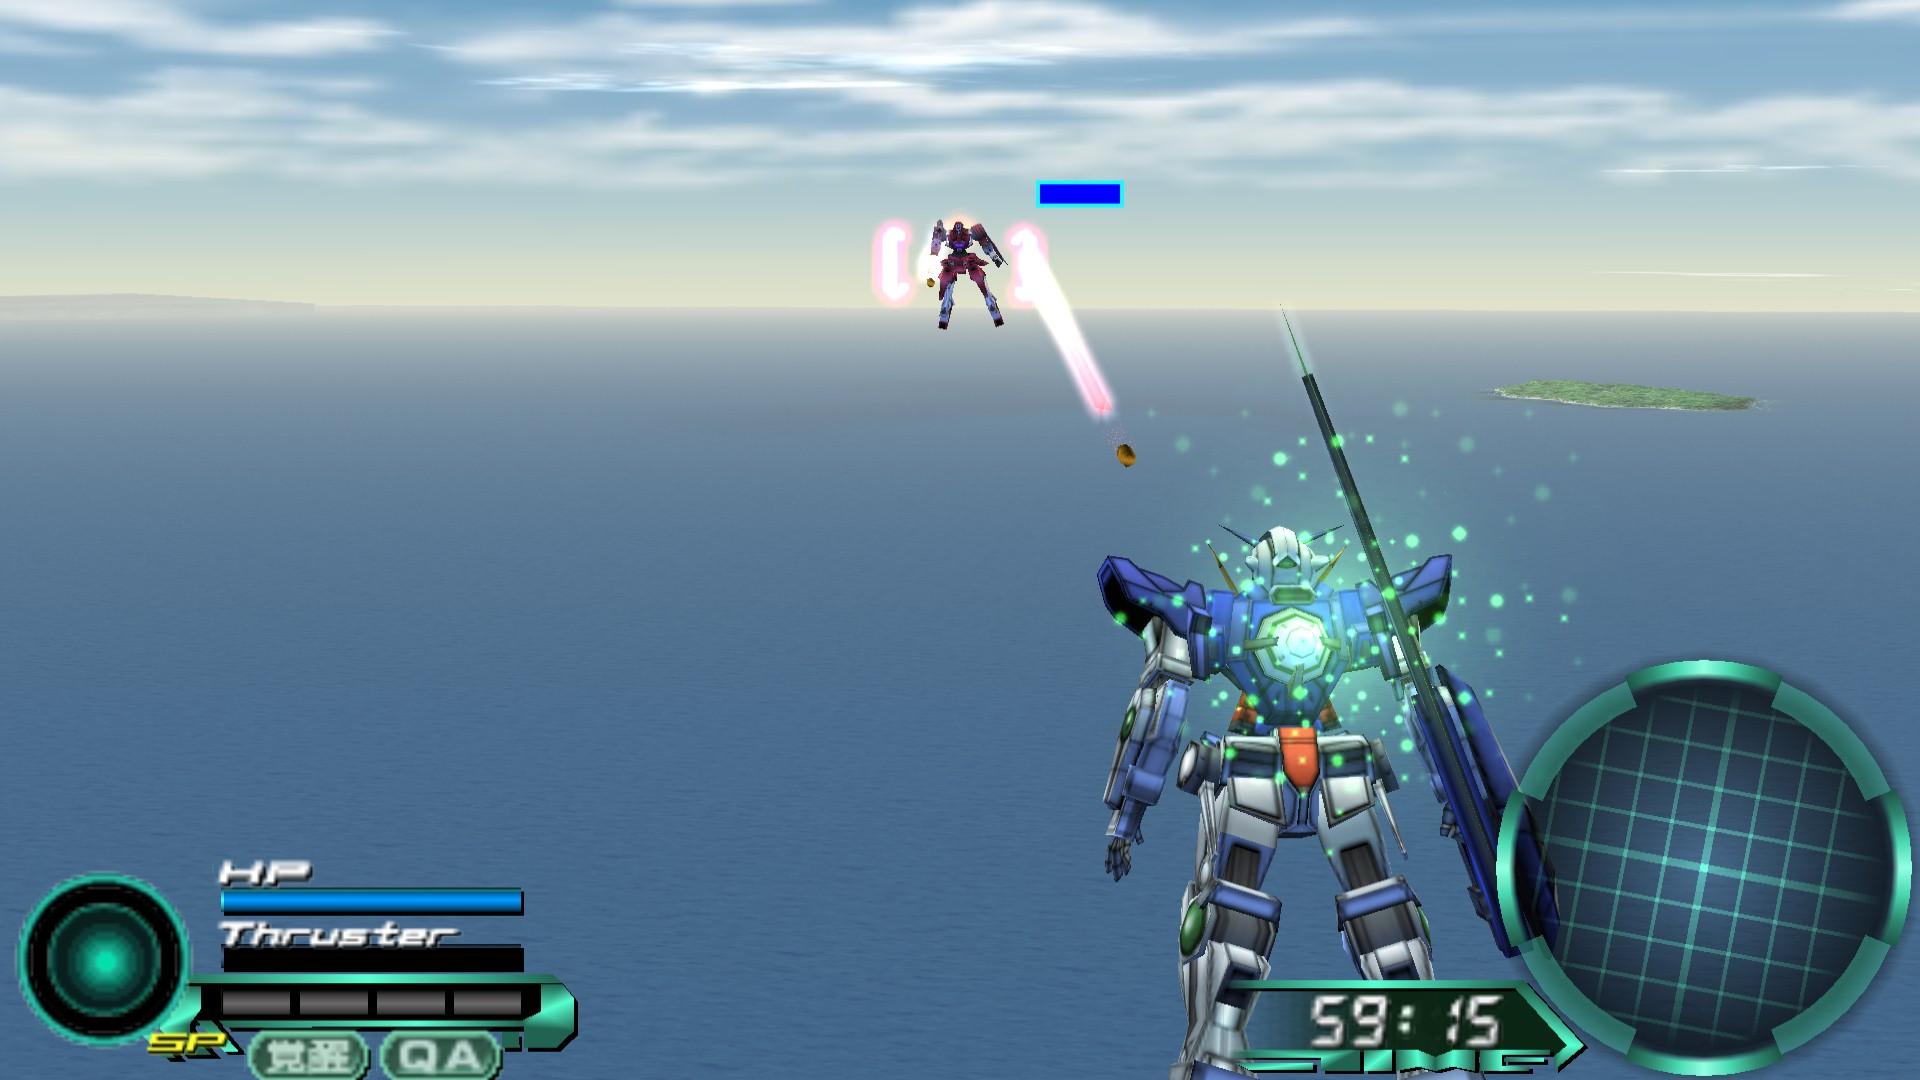 http://s.emuparadise.org/fup/up/158772-Gundam_Memories_-_Tatakai_no_Kioku_(Japan)-1.jpg